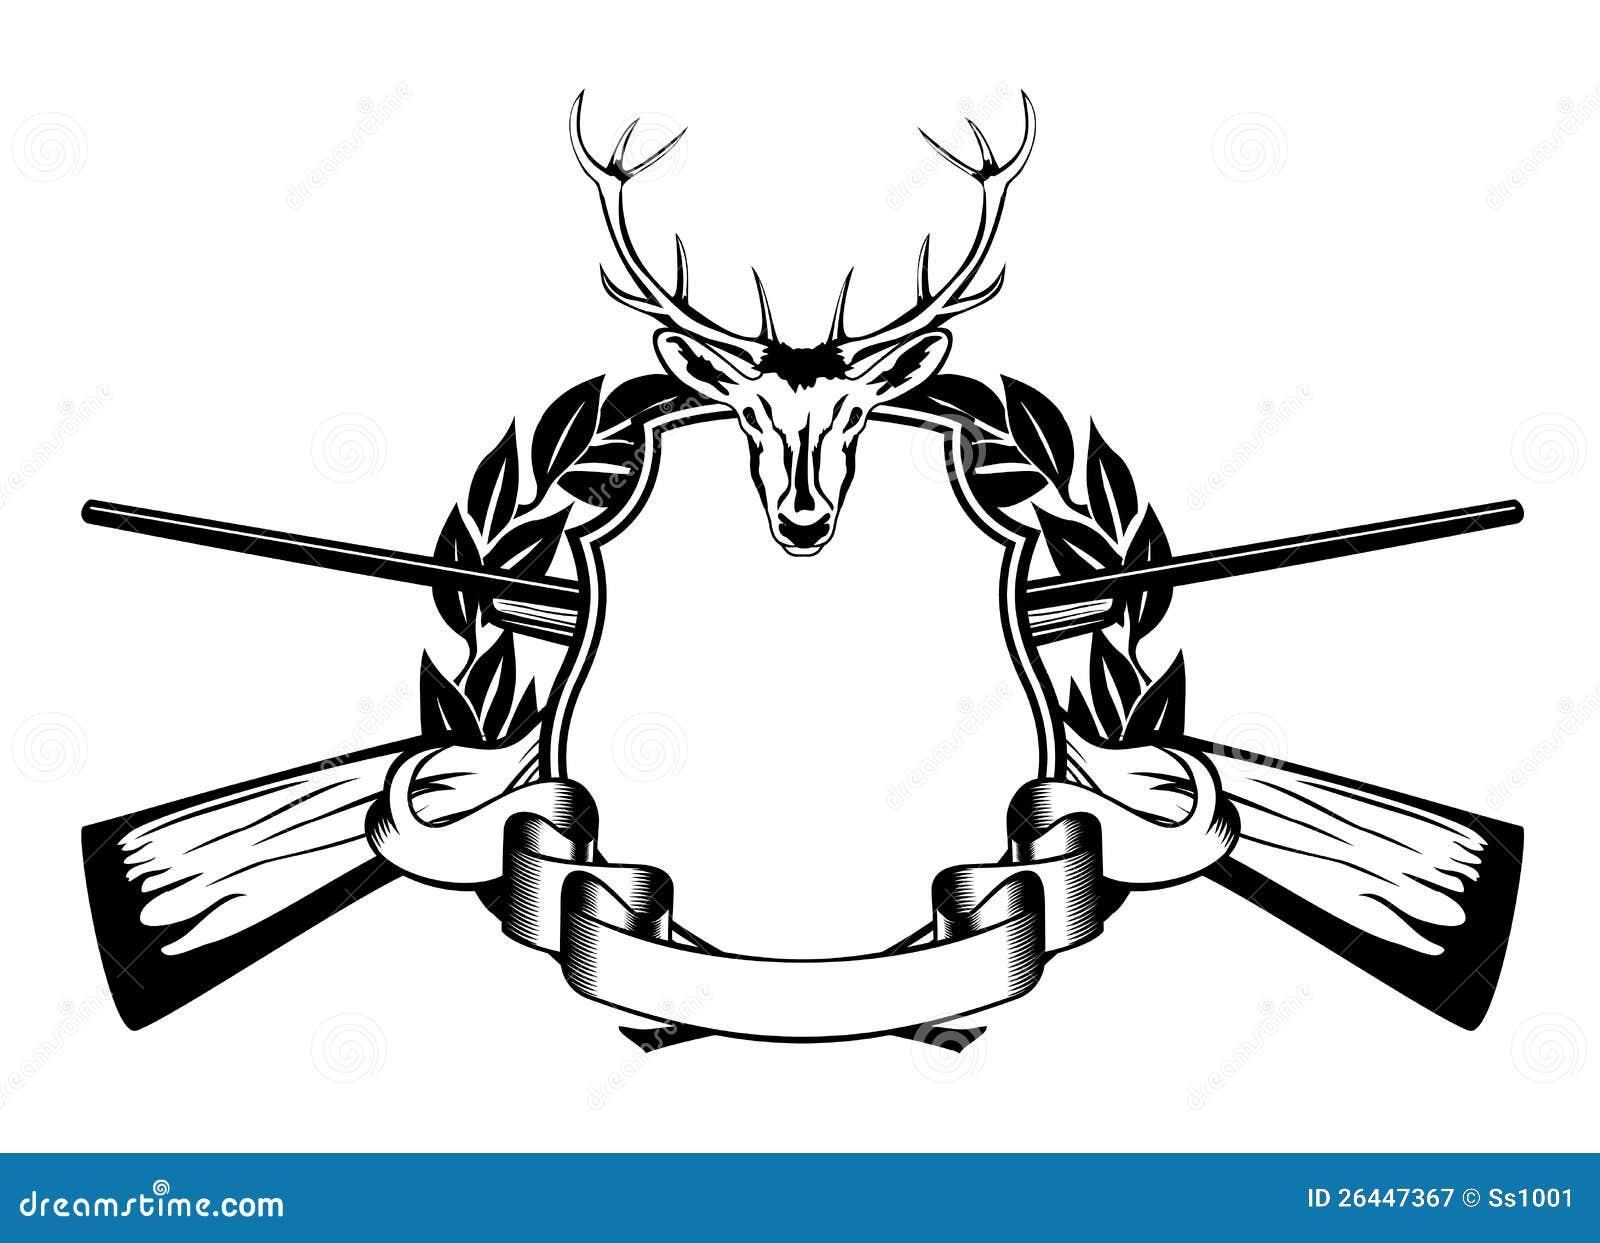 Framework Hunting Theme Royalty Free Stock Photography - Image ...